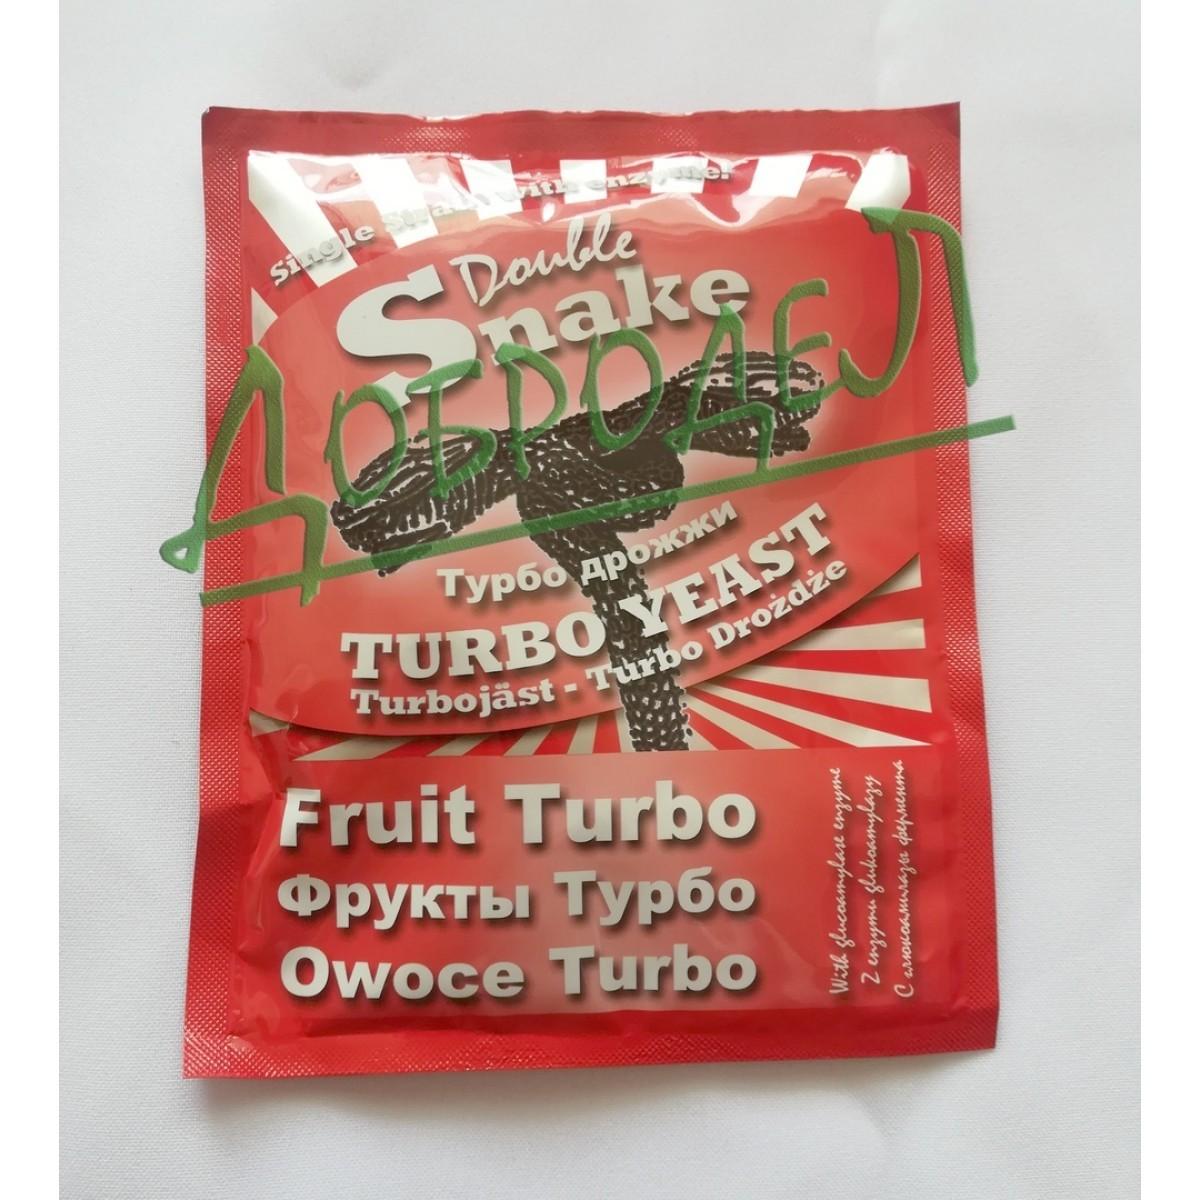 Турбо дрожжи DoubleSnake Fruit Turbo Фруктовые